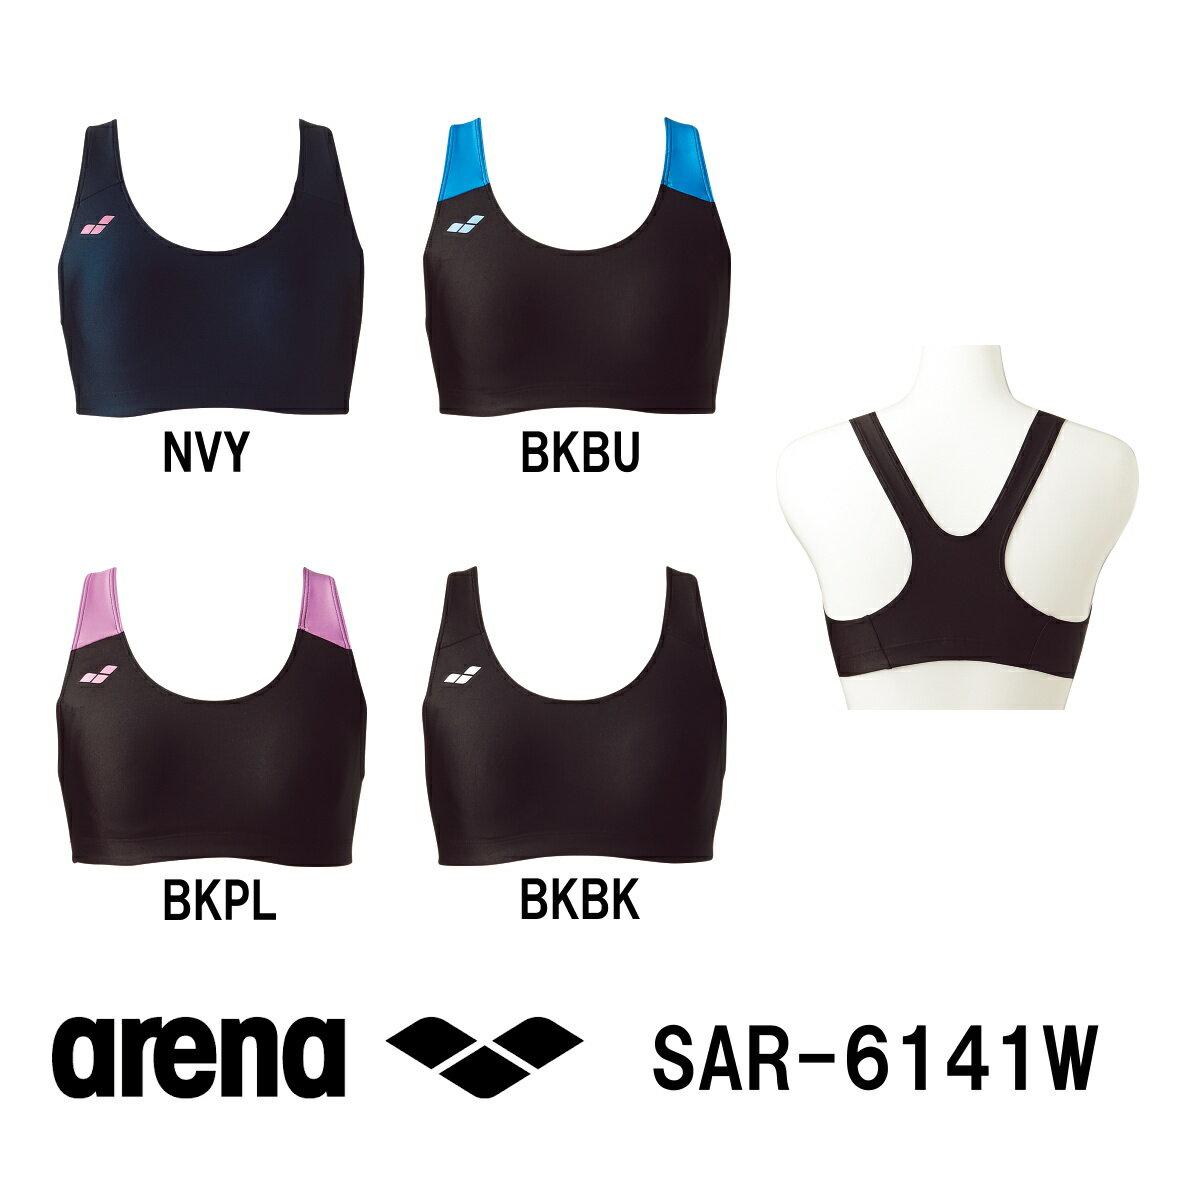 【SAR-6141W】ARENA(アリーナ)レディース競泳水着ダブルエステルブラトップ